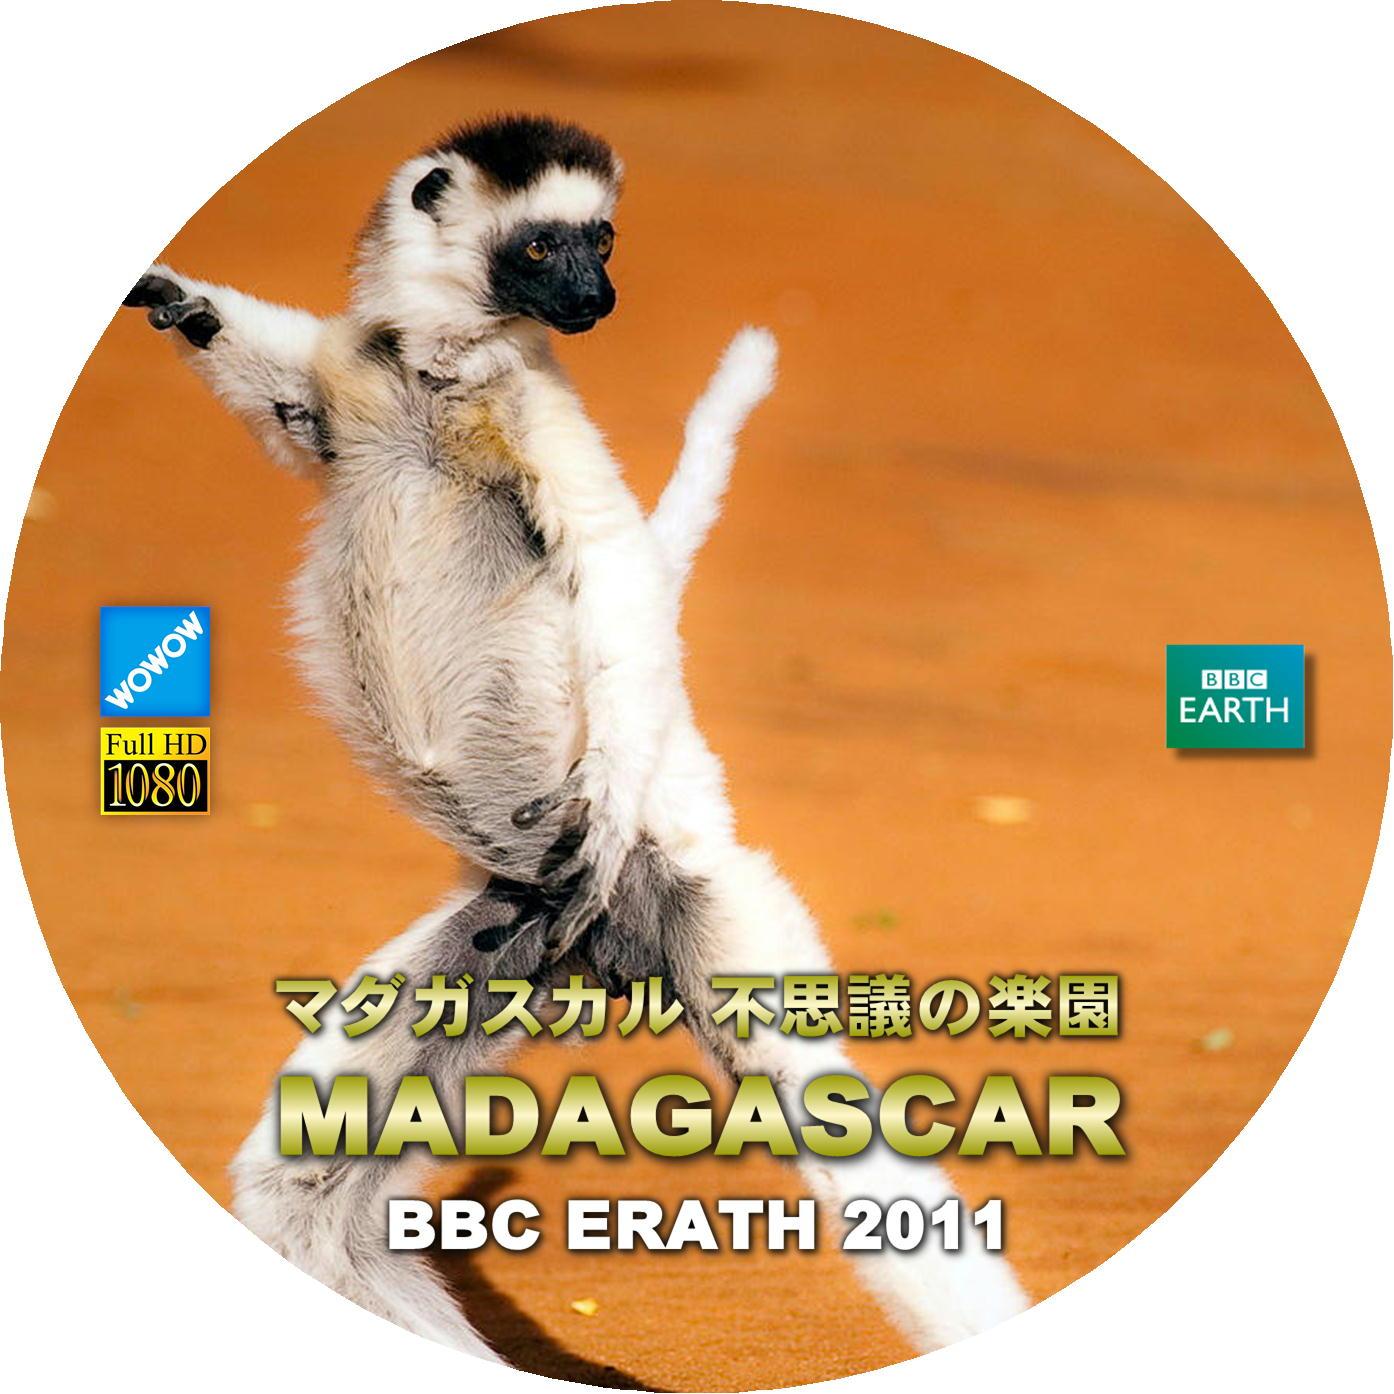 BBC EARTH 2011 マダカスカル 不思議の楽園 DVDラベル